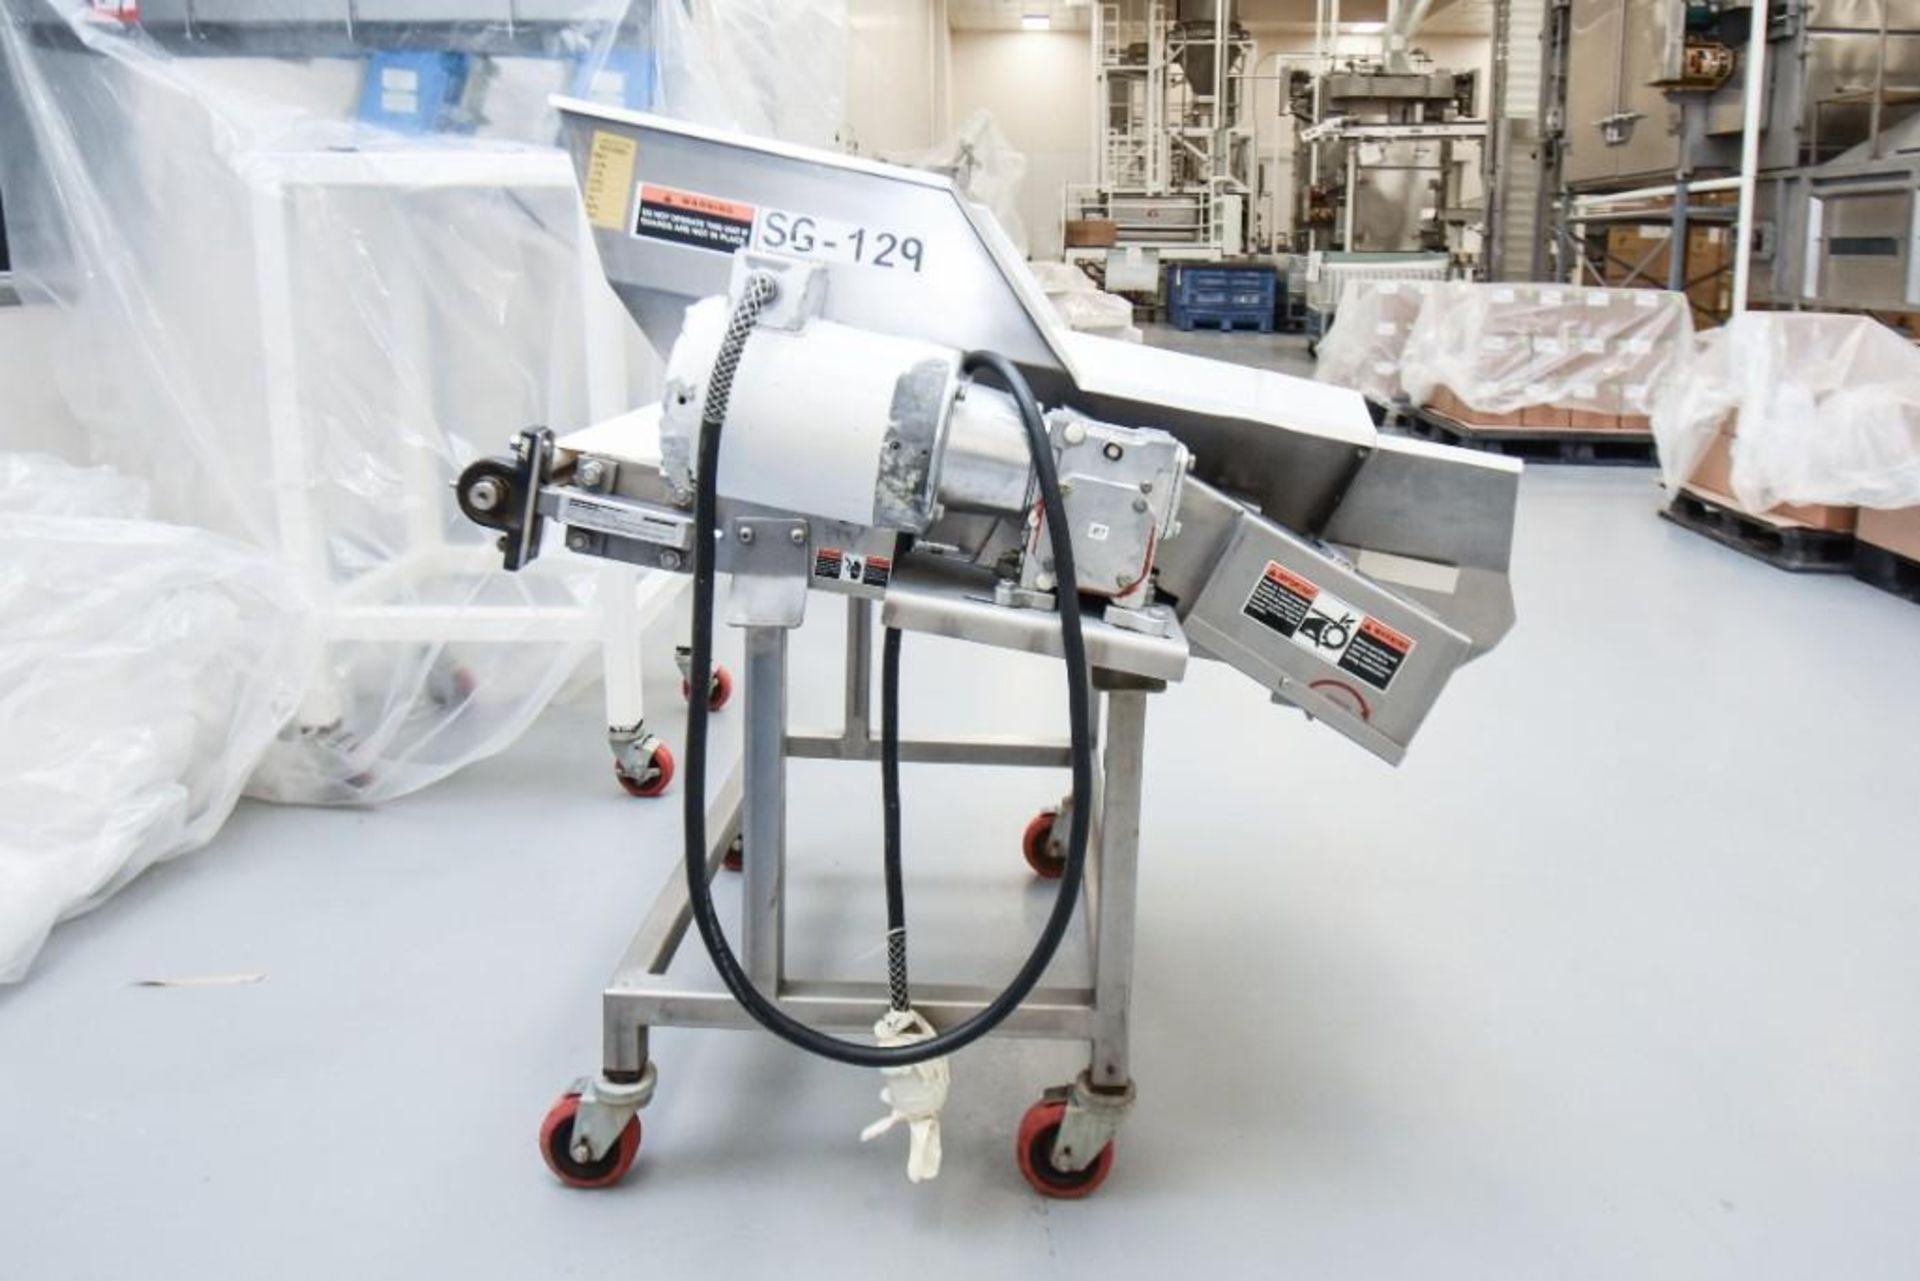 RBM Vibratory Deck With Food Grade Conveyor TS-B 24X3-0 - Image 2 of 7